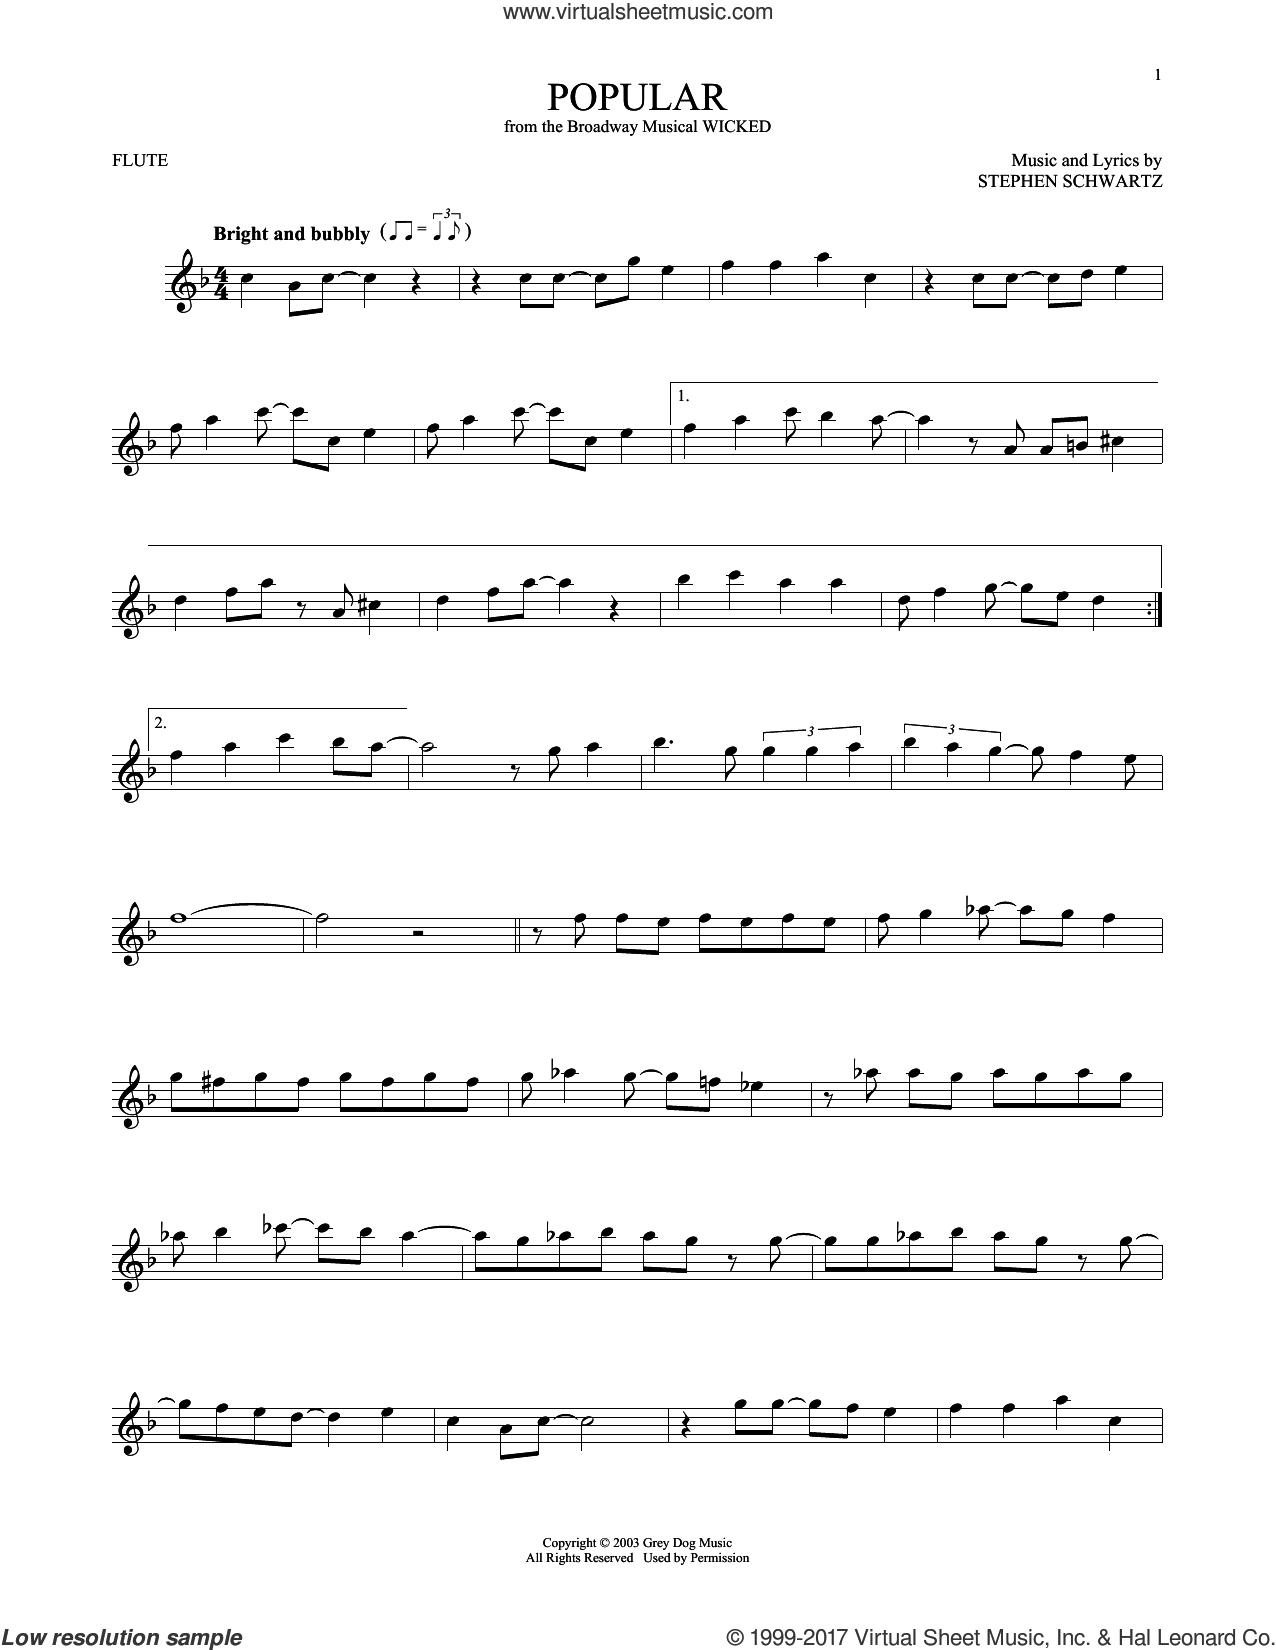 Popular (from Wicked) sheet music for flute solo by Stephen Schwartz, intermediate skill level